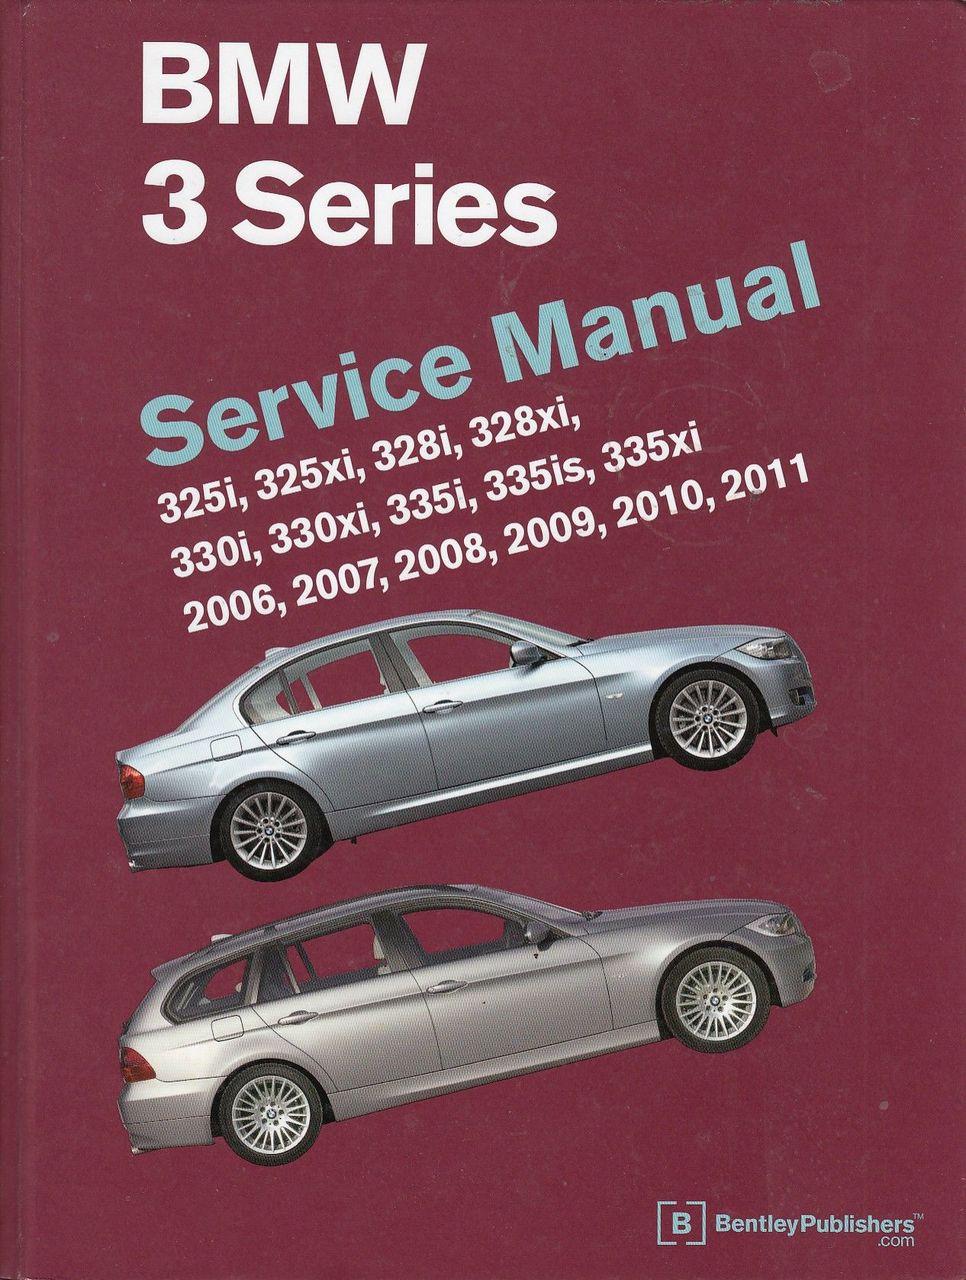 BMW 3 SERIES E90 E91 E92 E93 2006-2010 WORKSHOP SERVICE REPAIR MANUAL